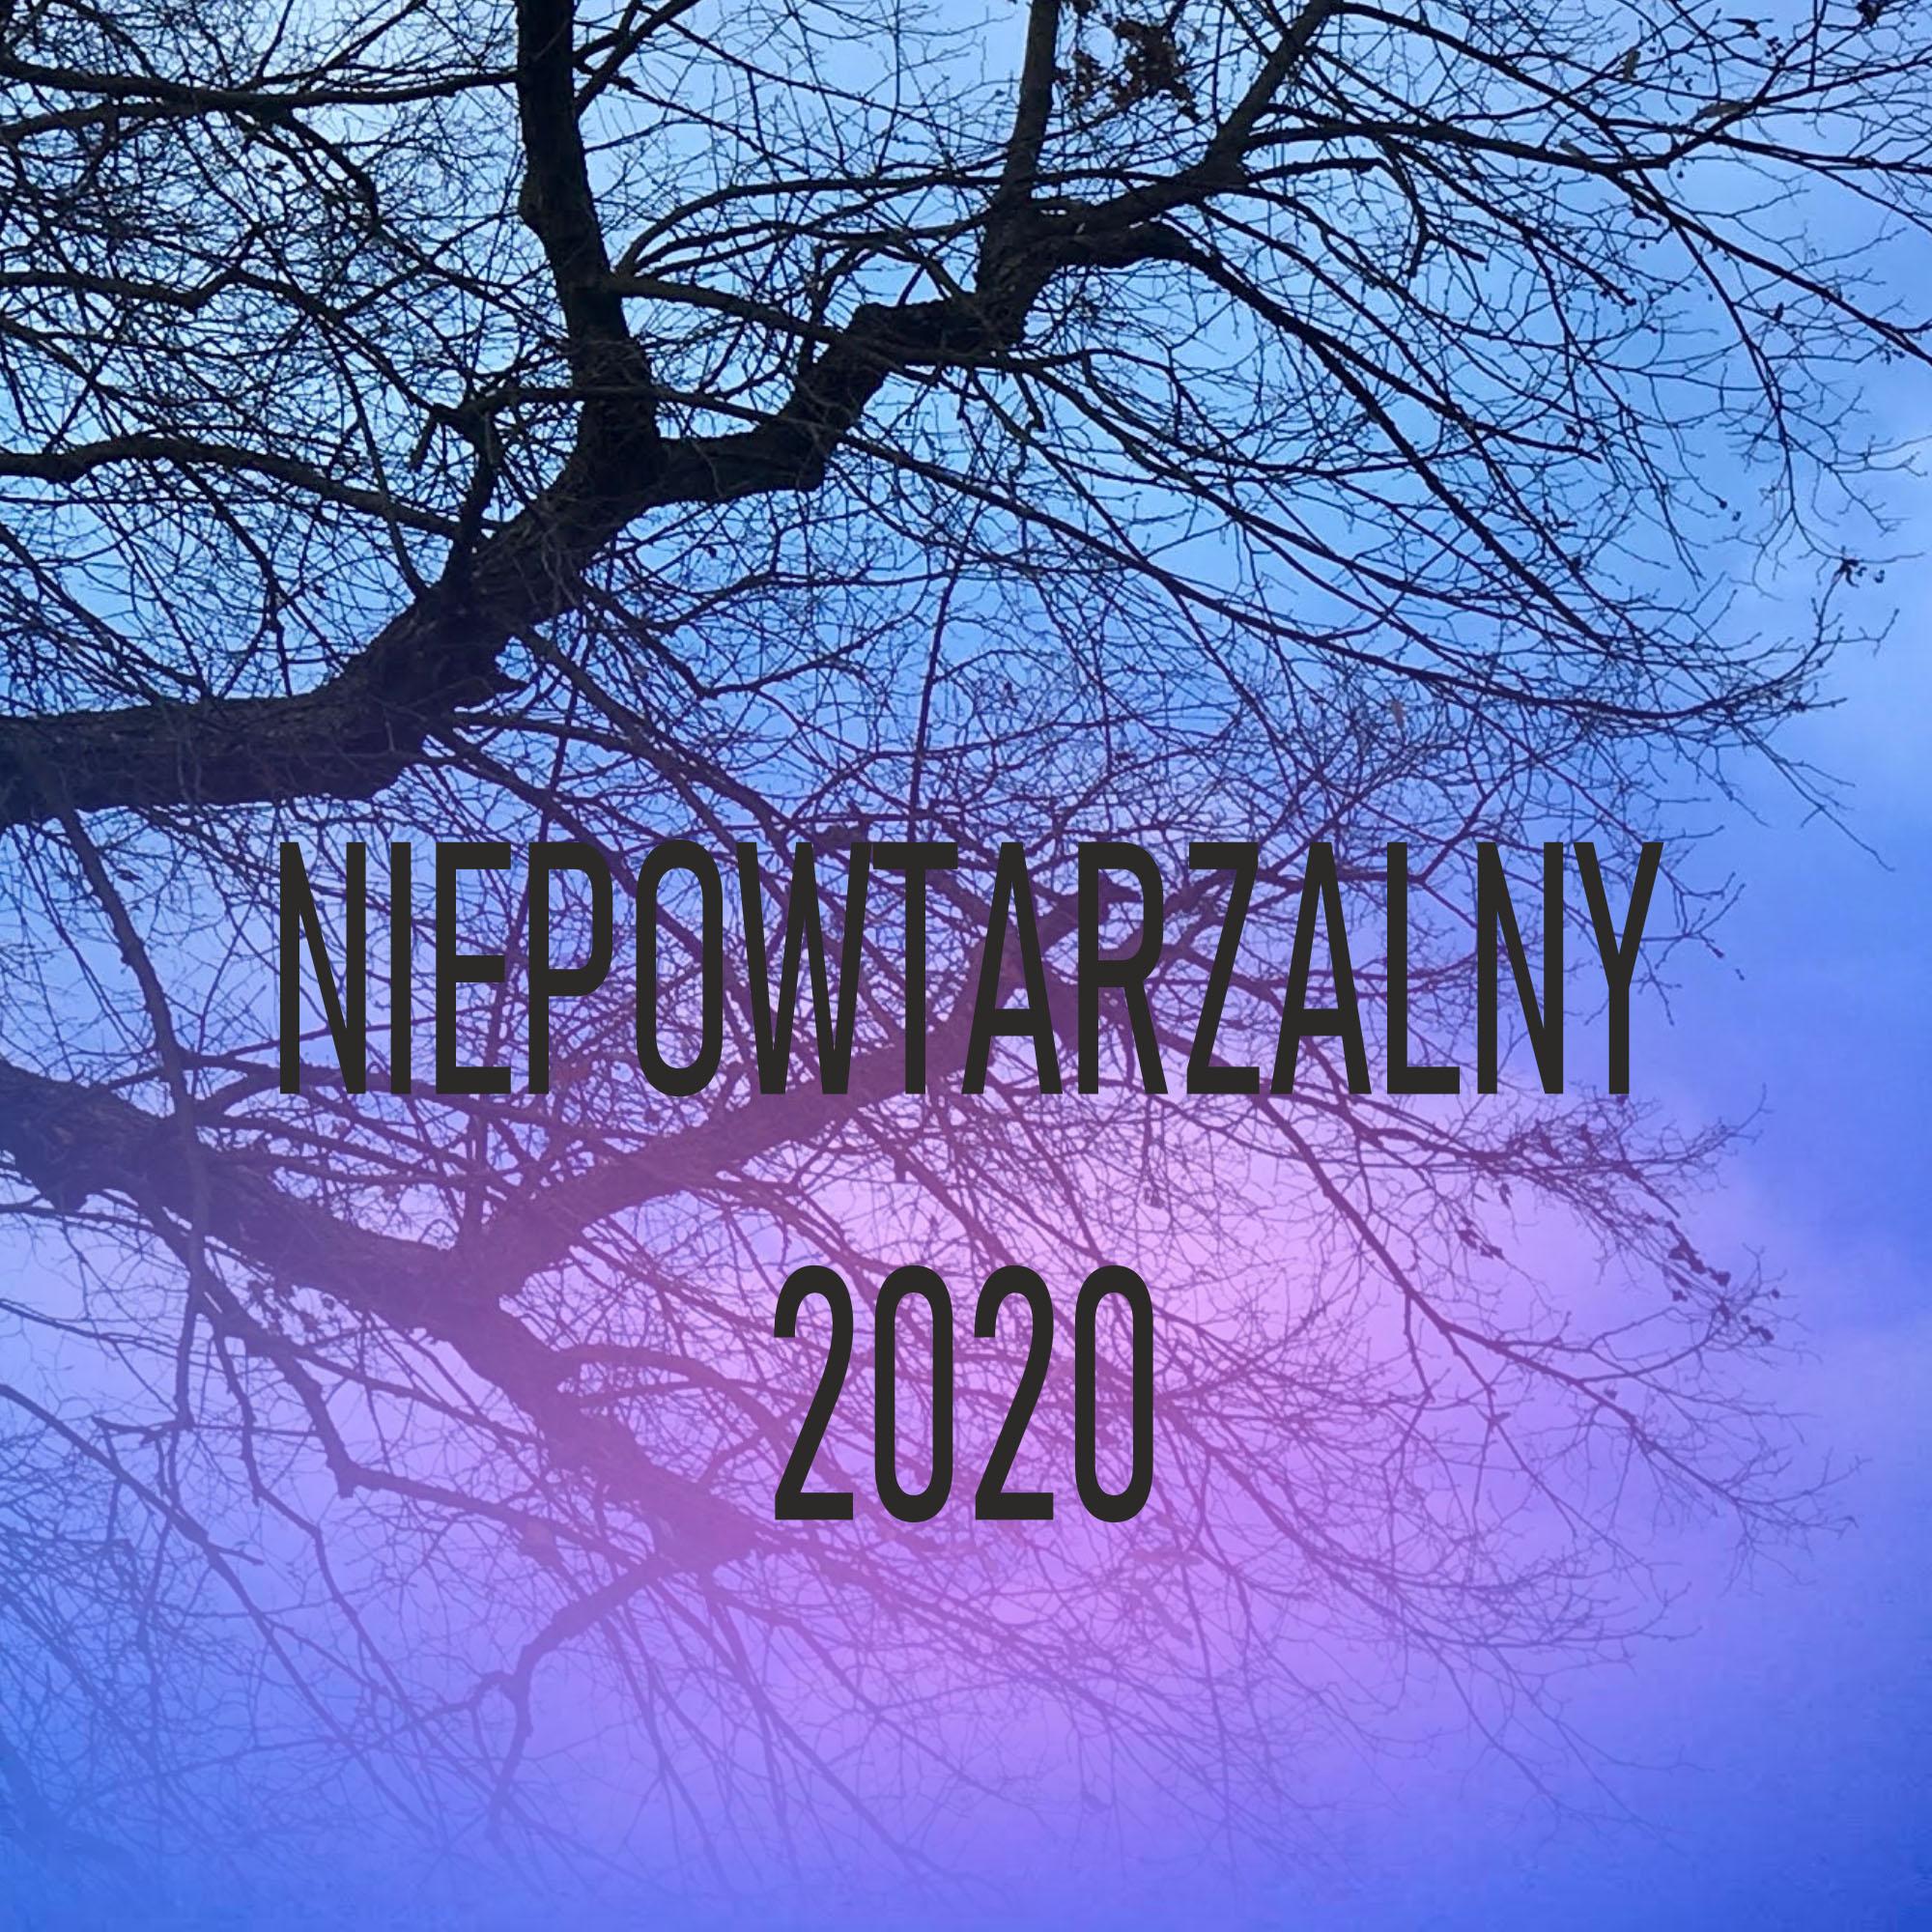 Niepowtarzalny 2020